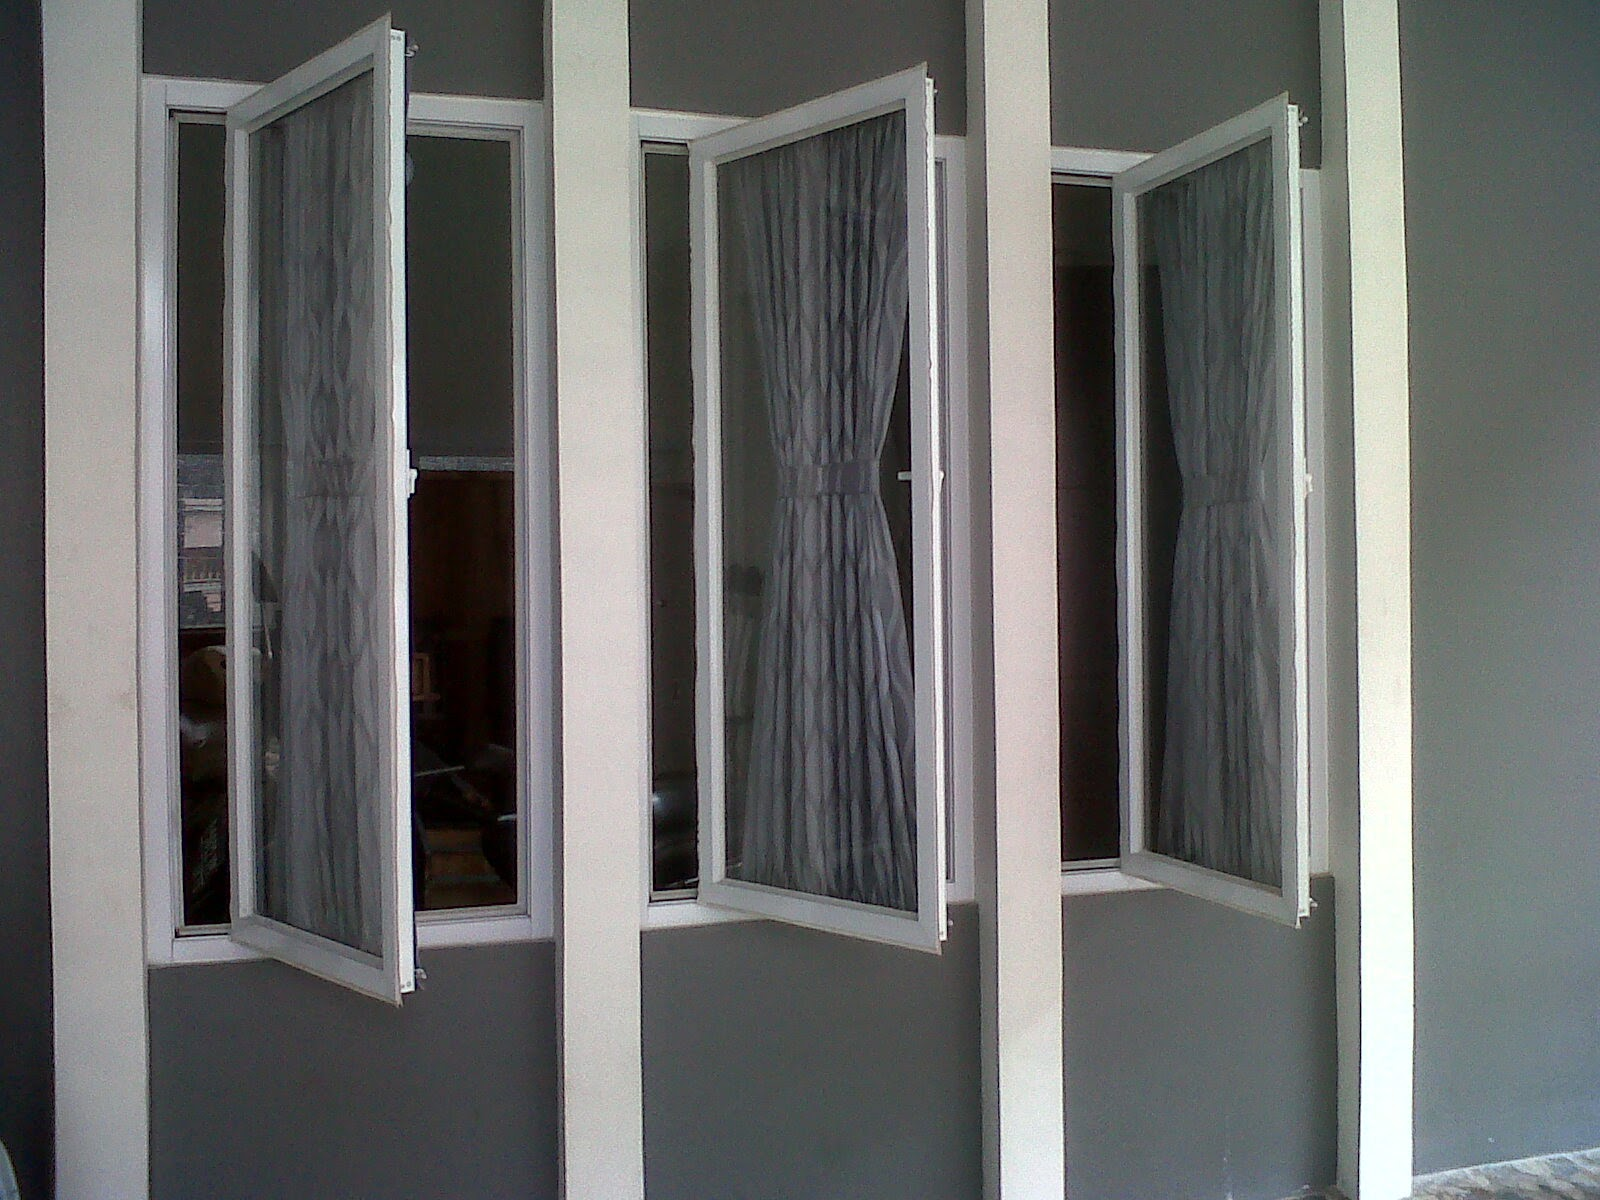 Kaca Tempered Dan Laminated: Jendela Alumunium Casement